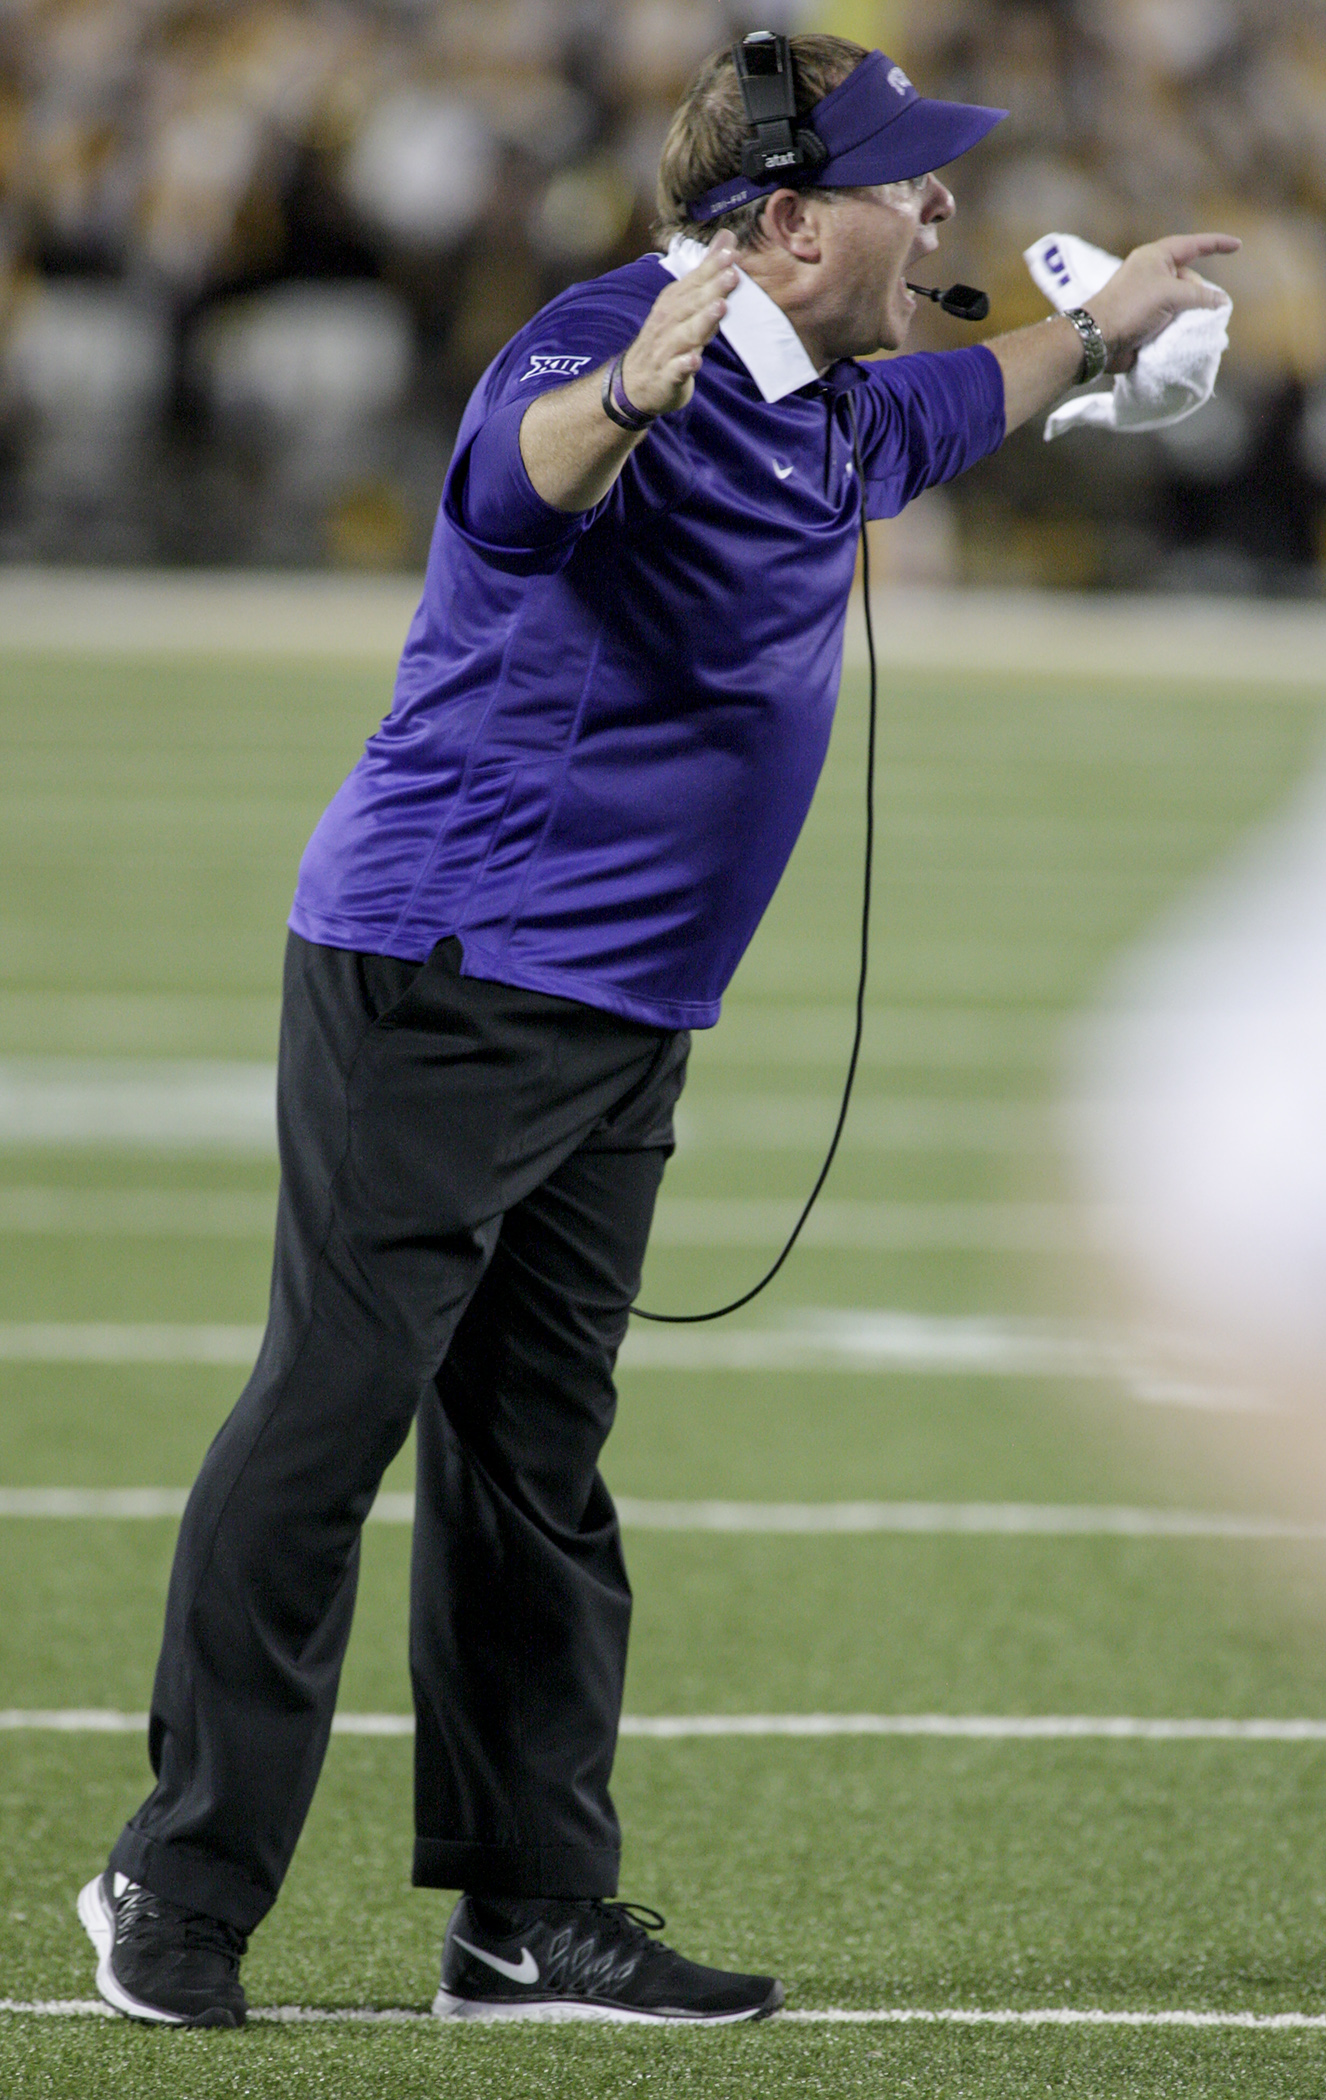 TCU head coach Gary Patterson yells to his team during the second half of an NCAA college football game against Minnesota on Thursday, Sept. 3, 2015, in Minneapolis. TCU won 23-17. (AP Photo/Paul Battaglia)